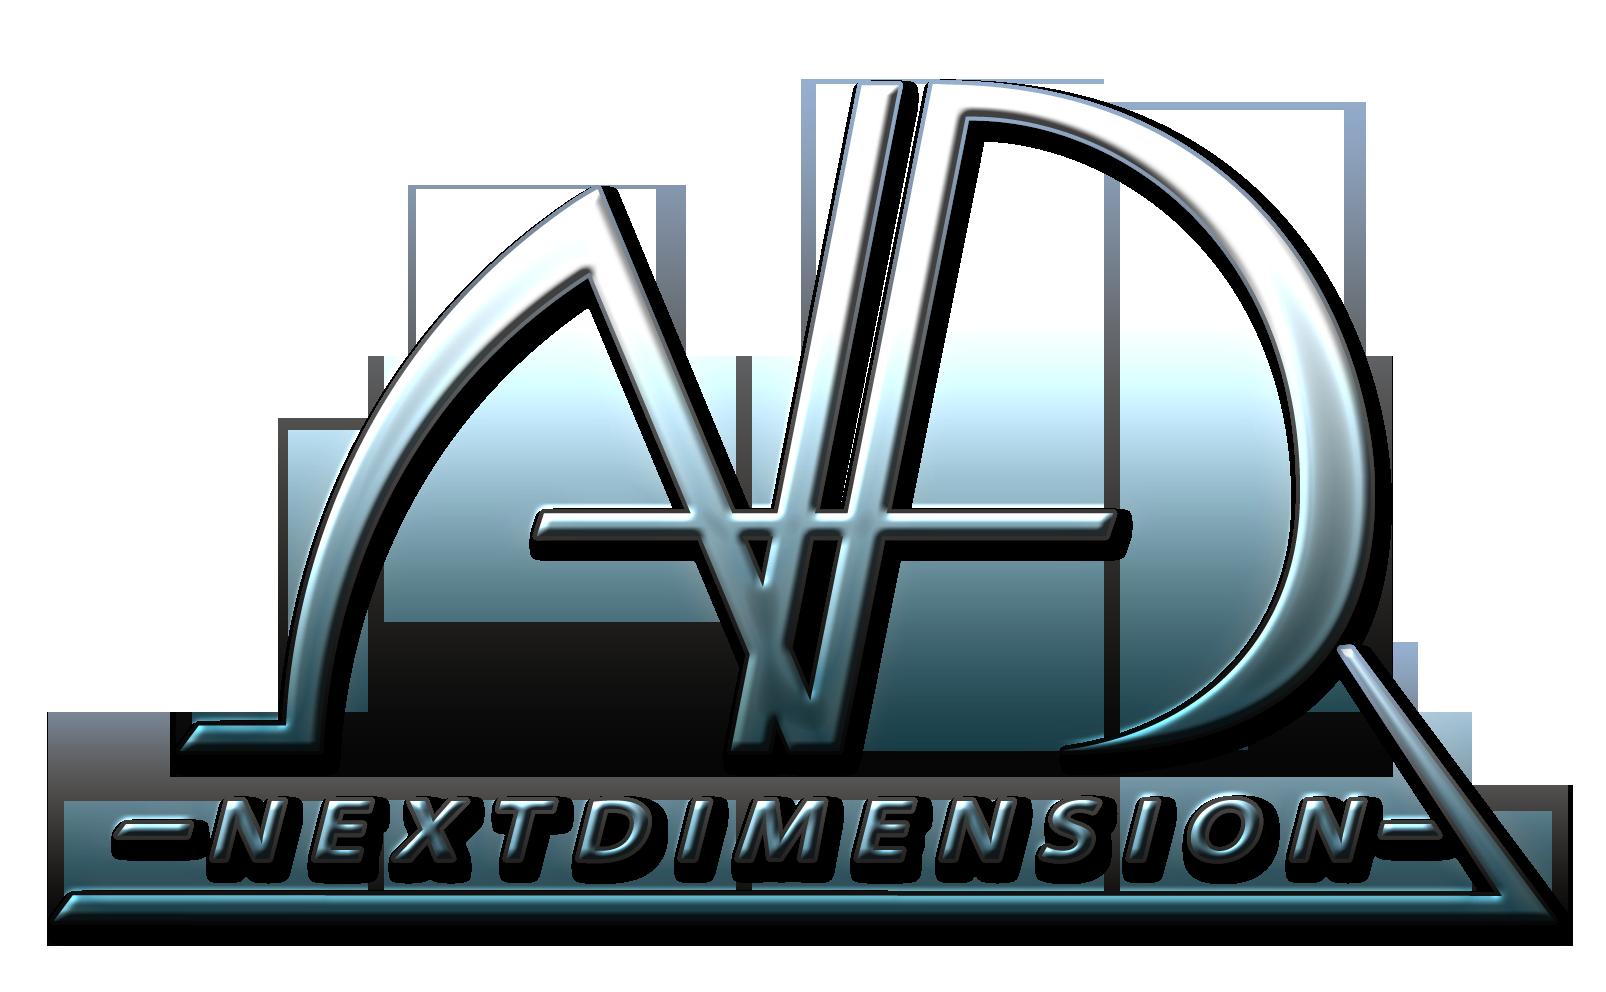 NEXTDIMENSIONオフィシャルウェブサイト